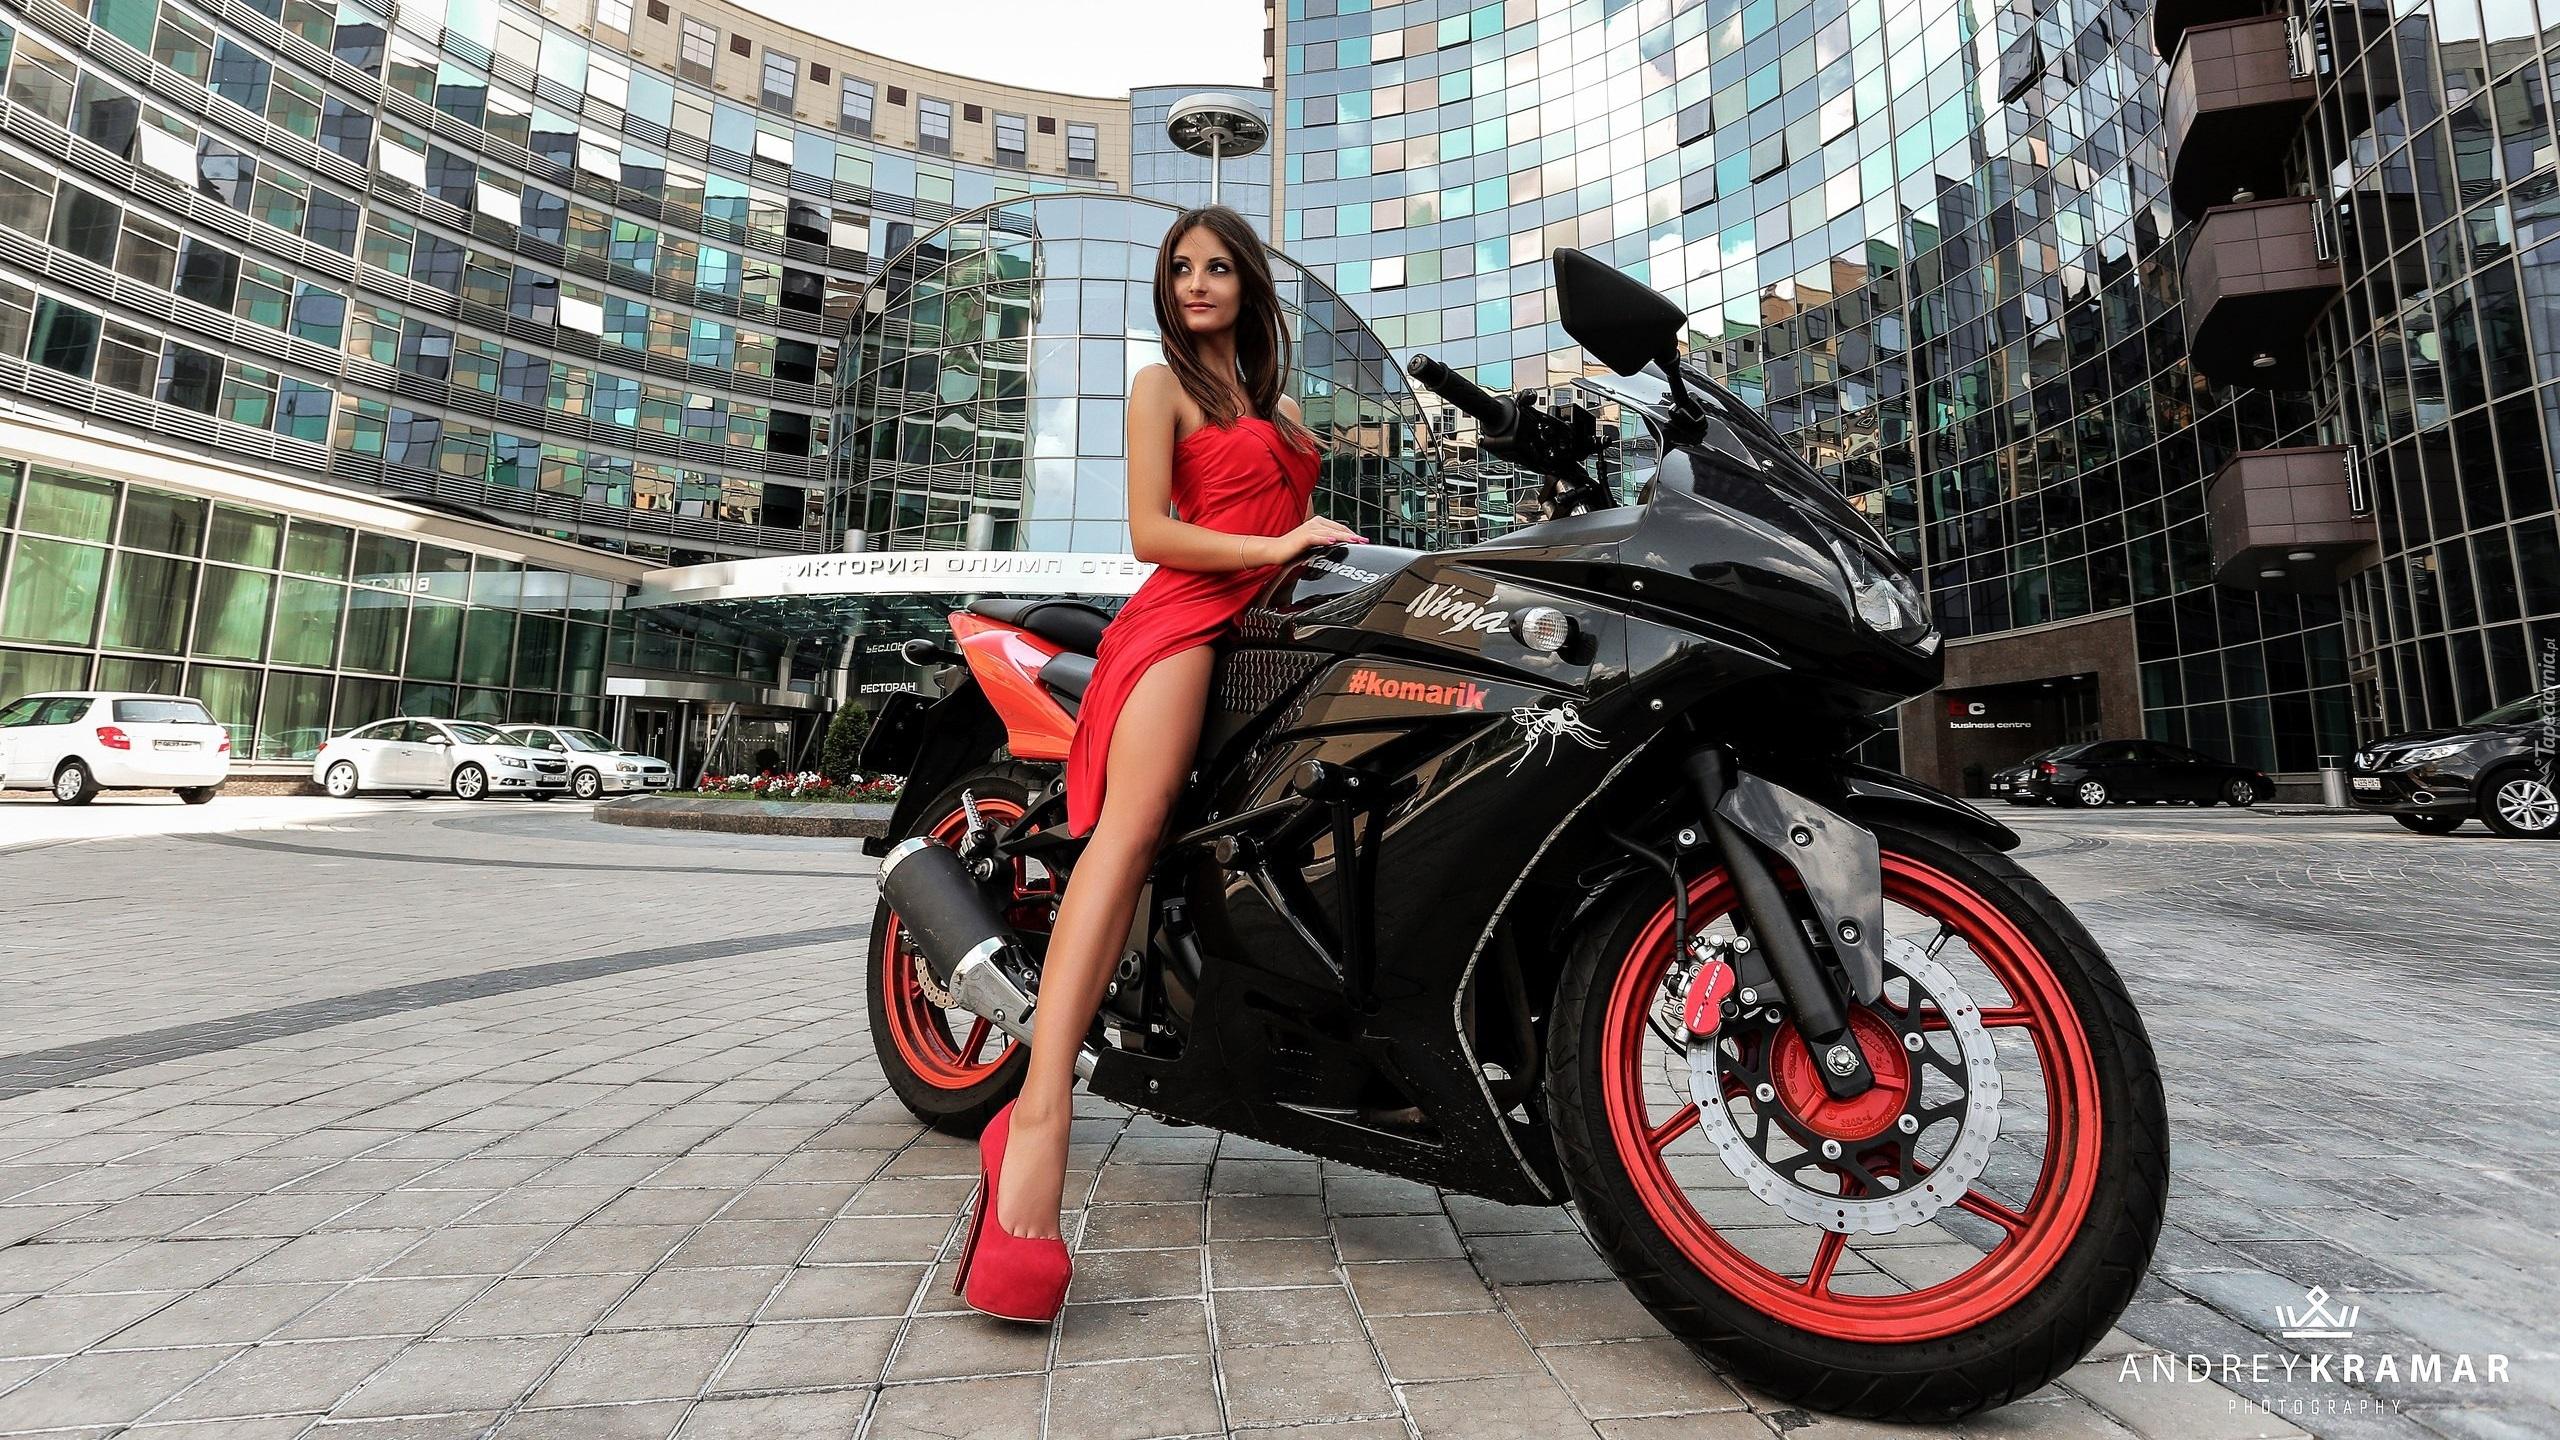 Kawasaki Enduro 650 >> Kobieta w czerwonej sukience na motocyklu Kawasaki Ninja